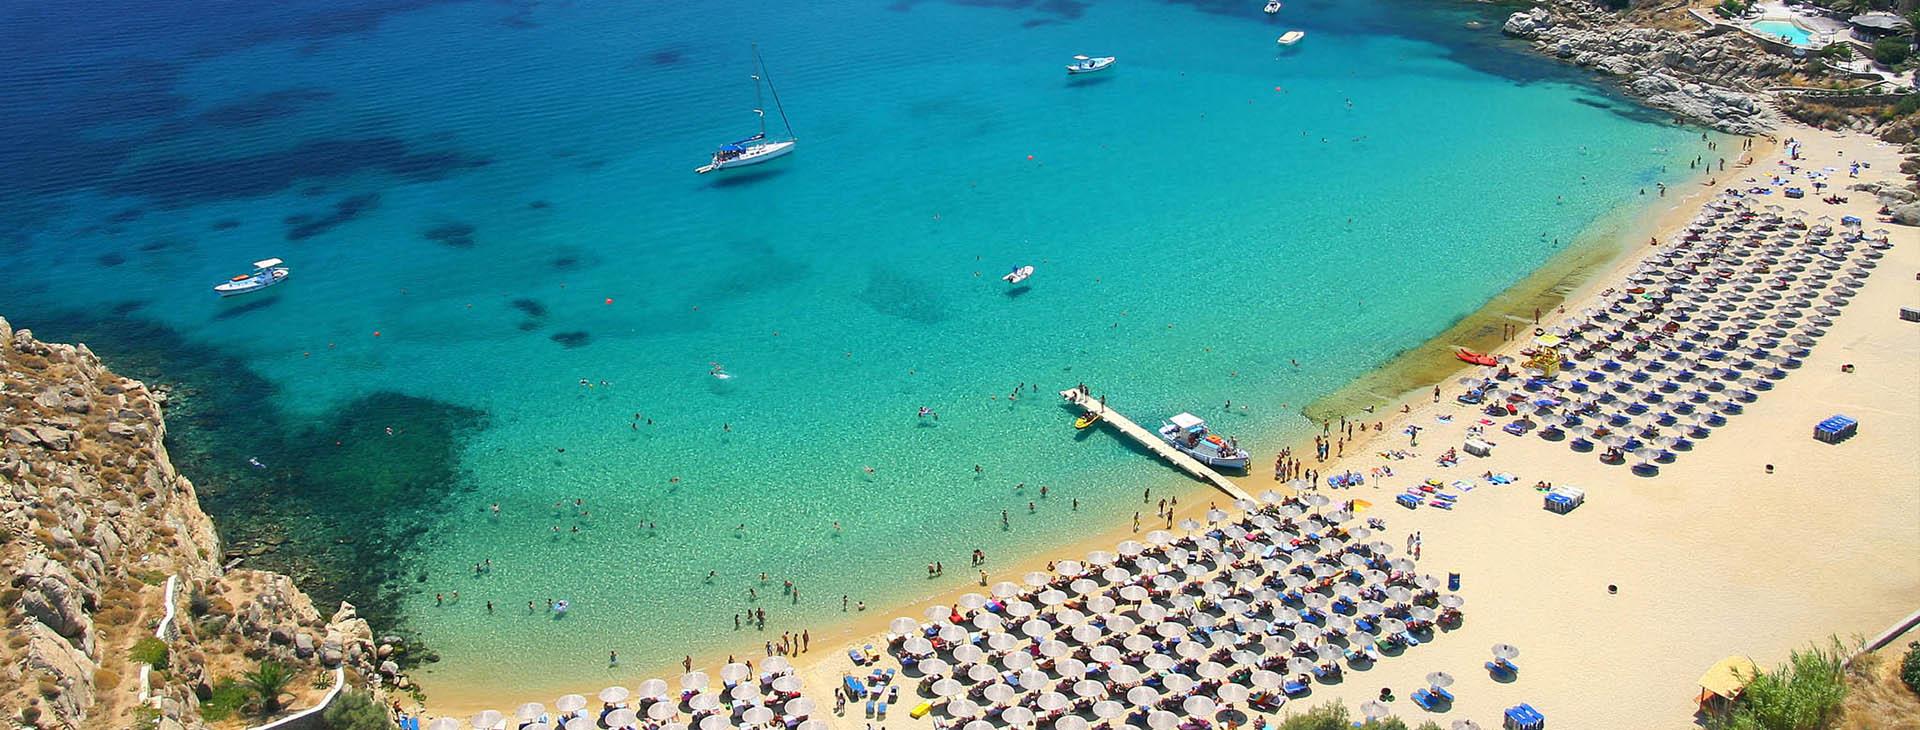 Paradise Beach at Mykonos island